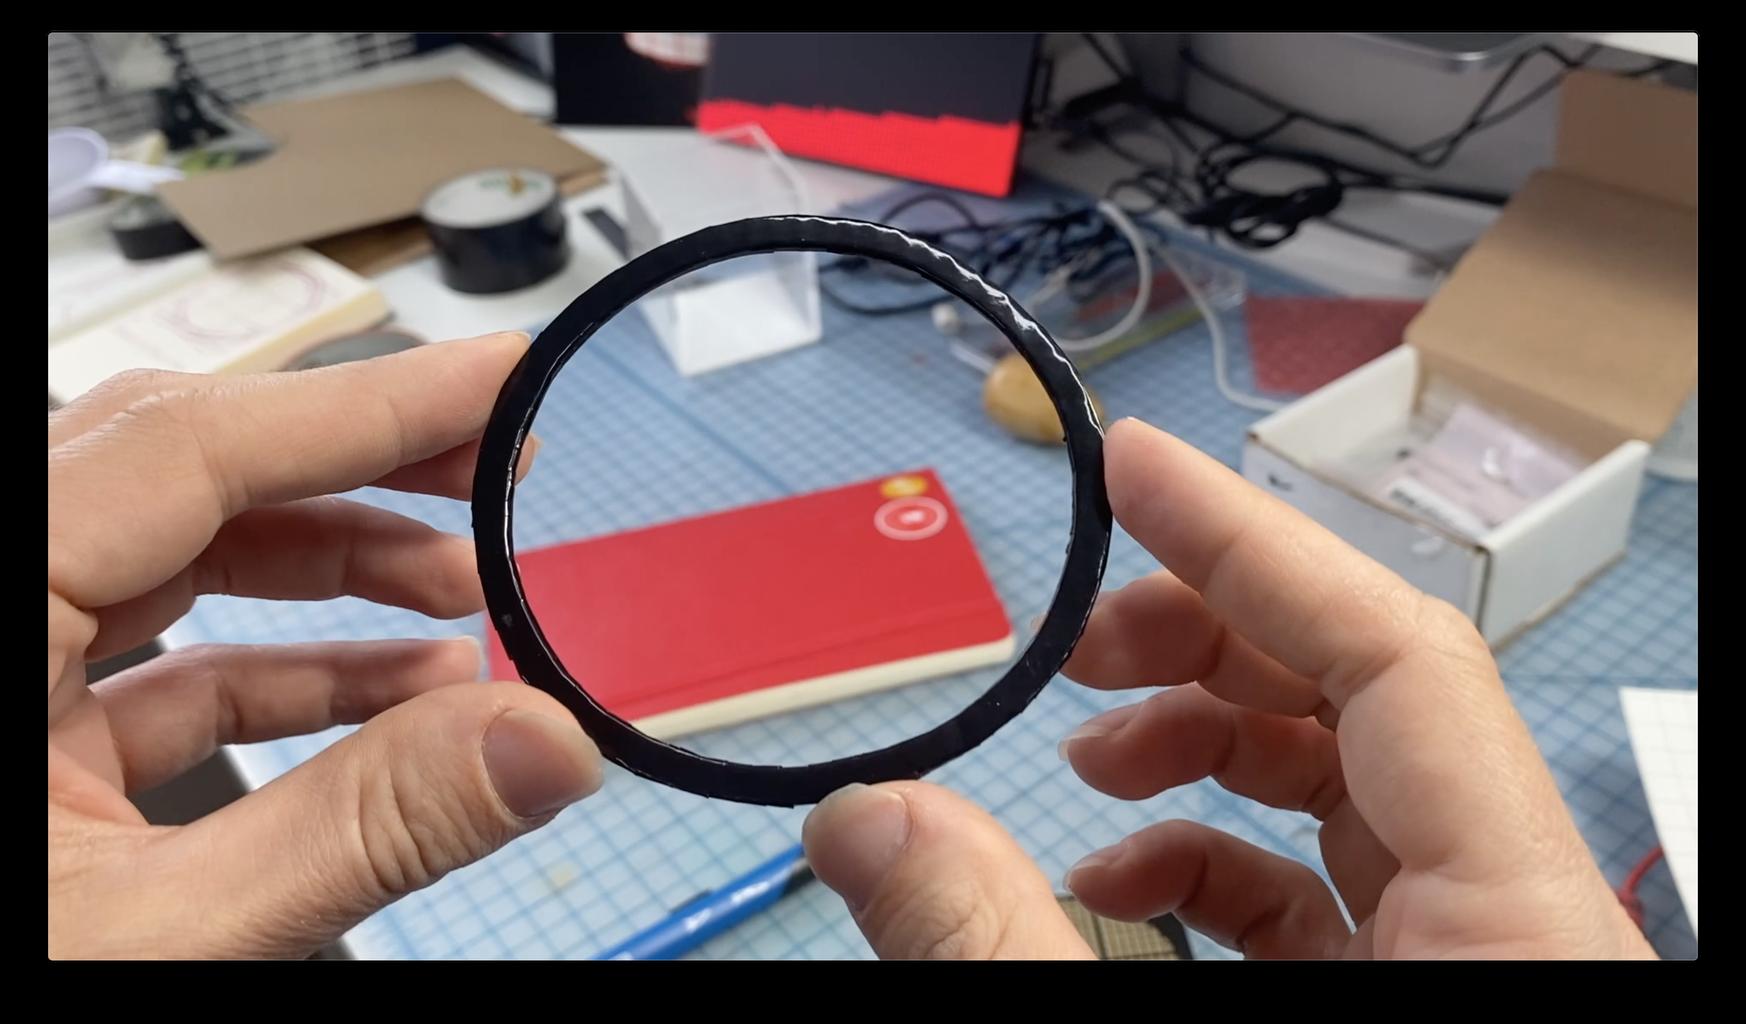 Add Vinyl to Make It Look Like Plastic